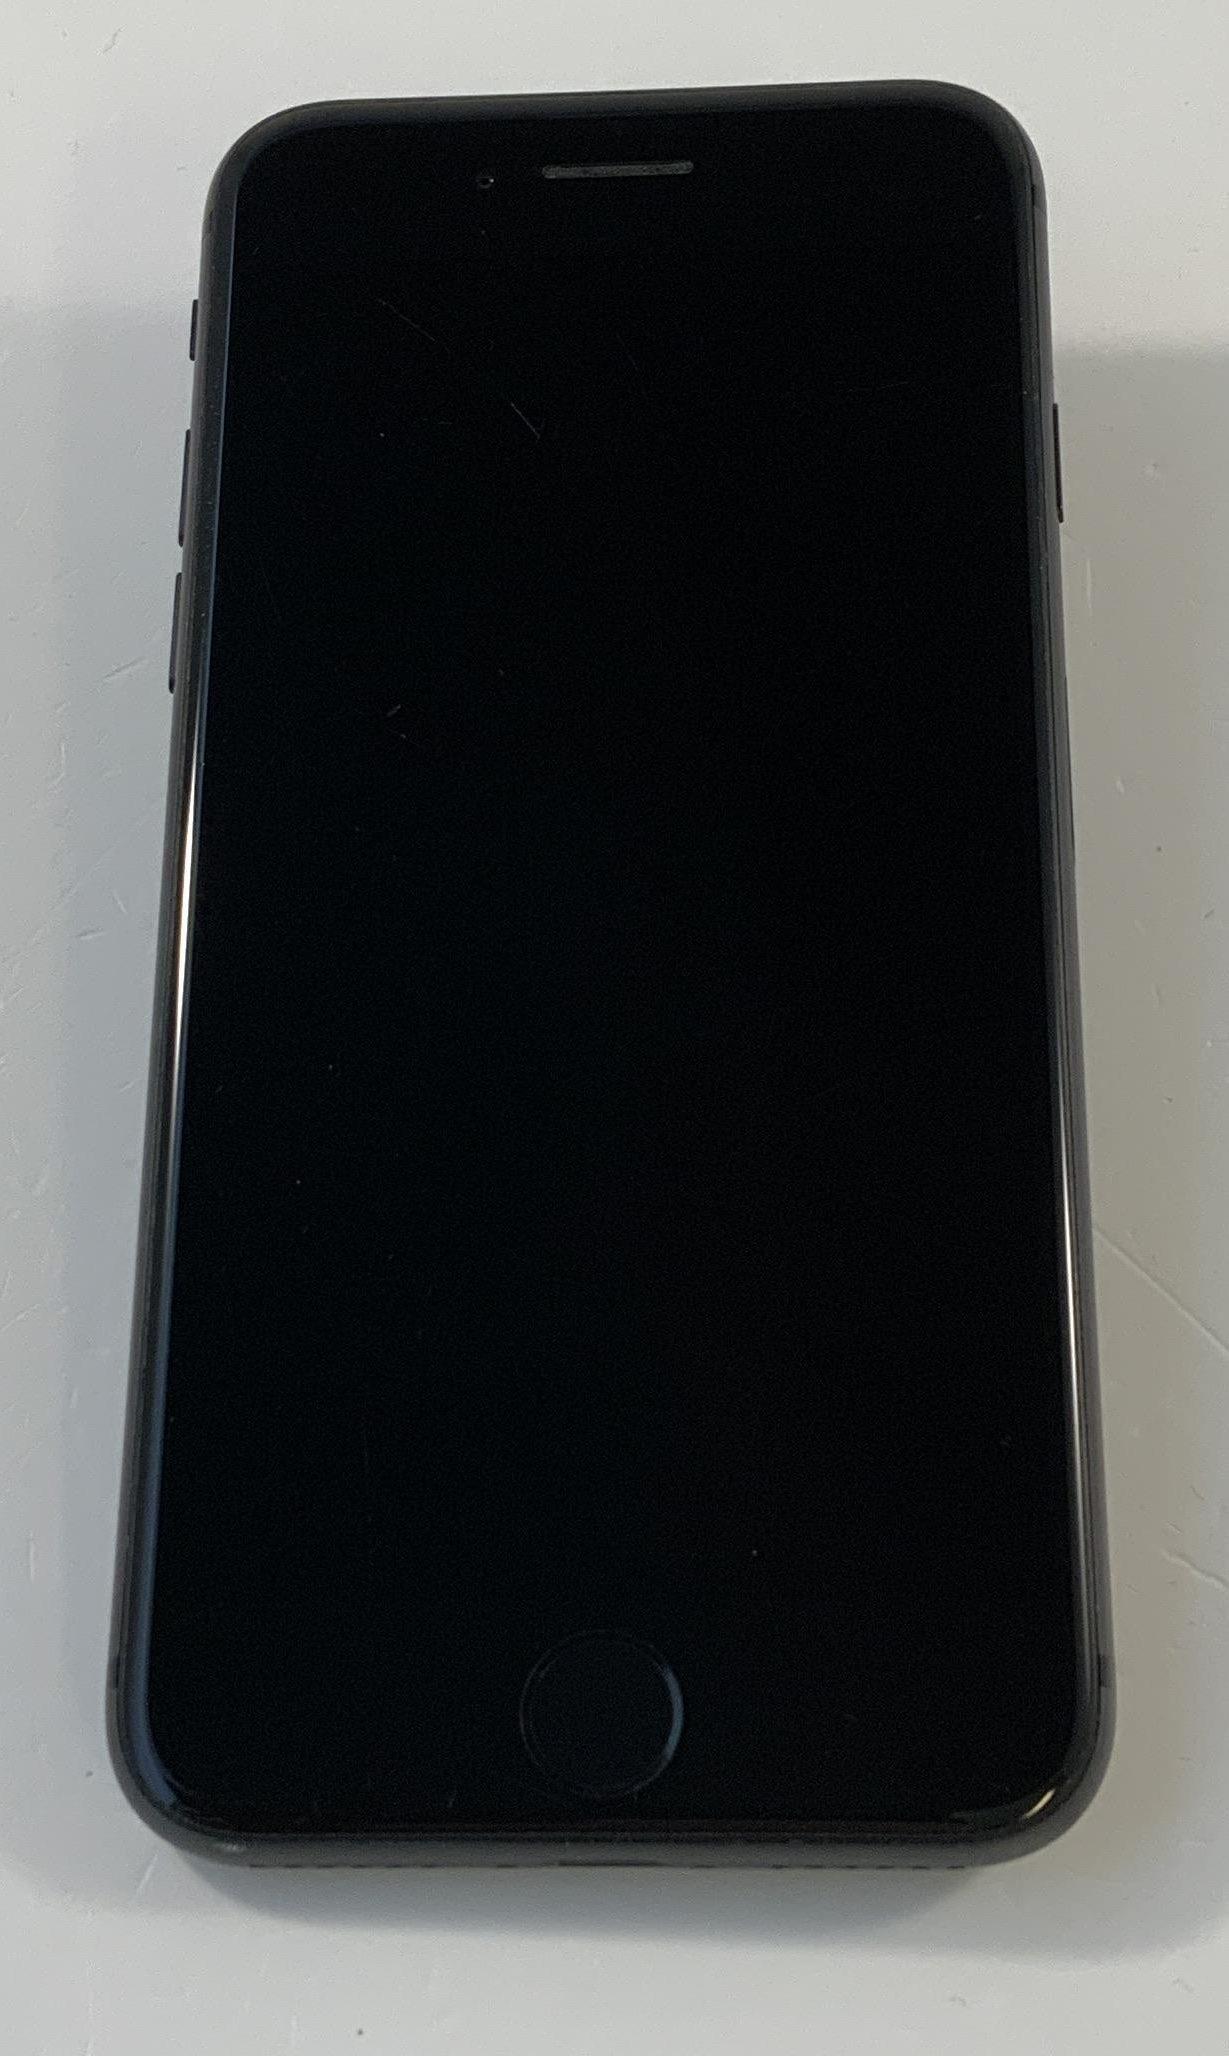 iPhone 8 64GB, 64GB, Space Gray, image 1